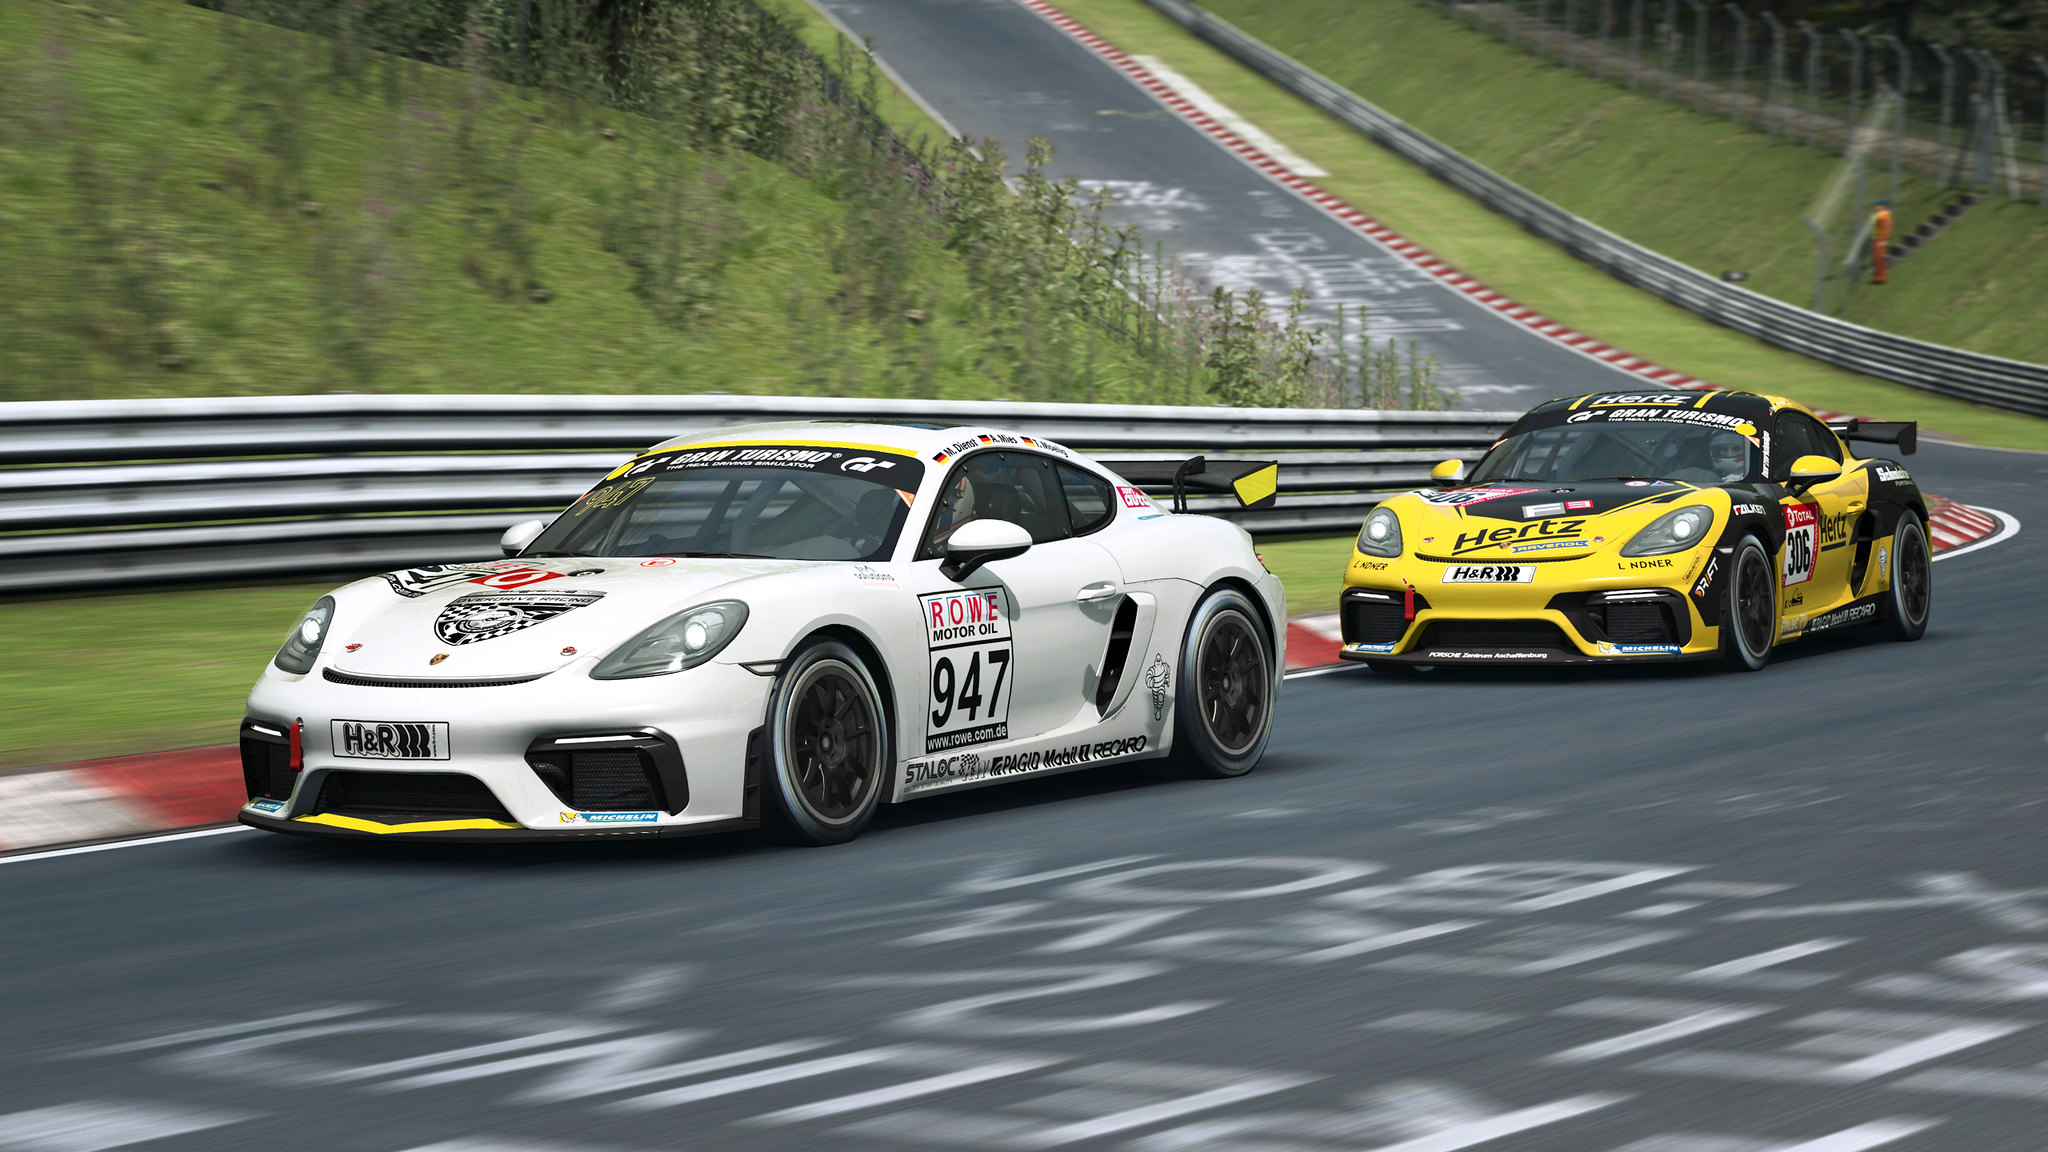 R3E_Porsche_718_GT4.jpg